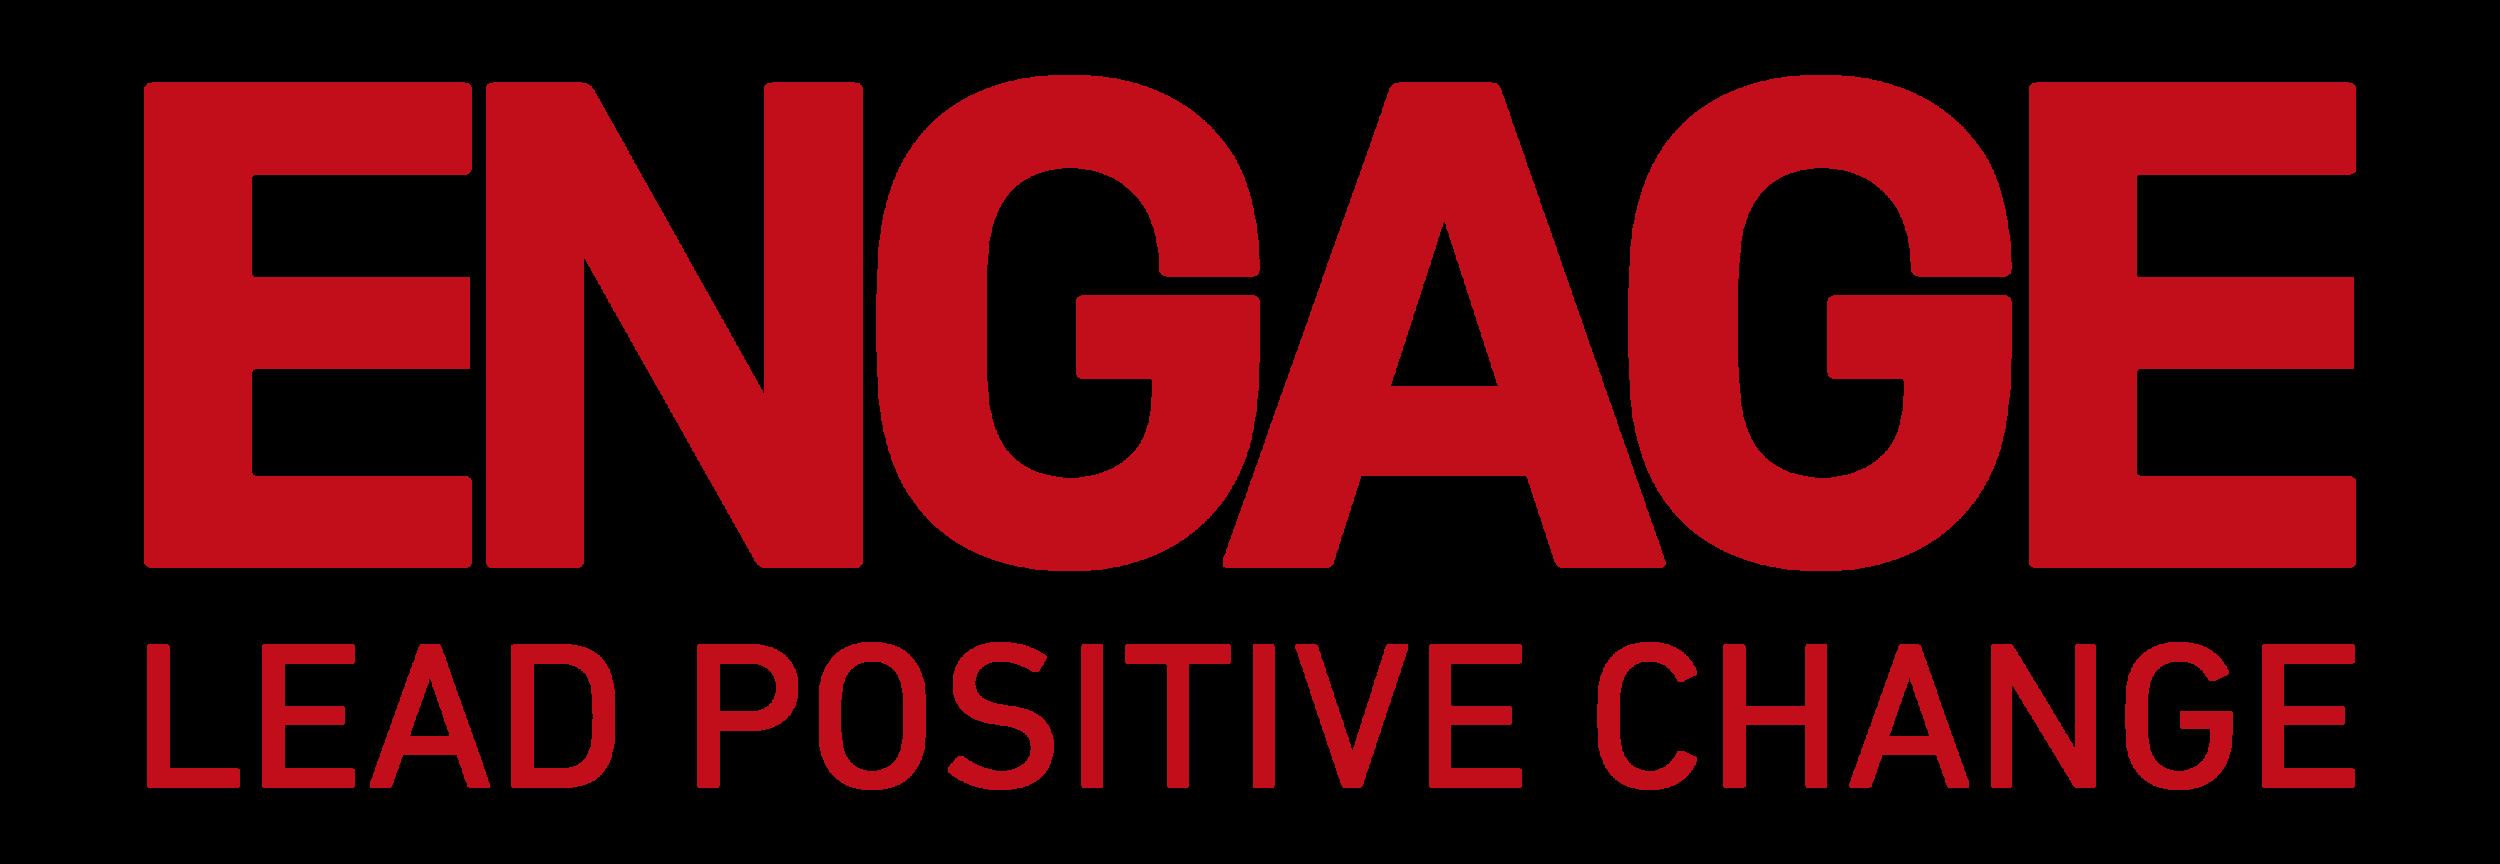 LOGO_LeadPositiveChange_Rouge.png